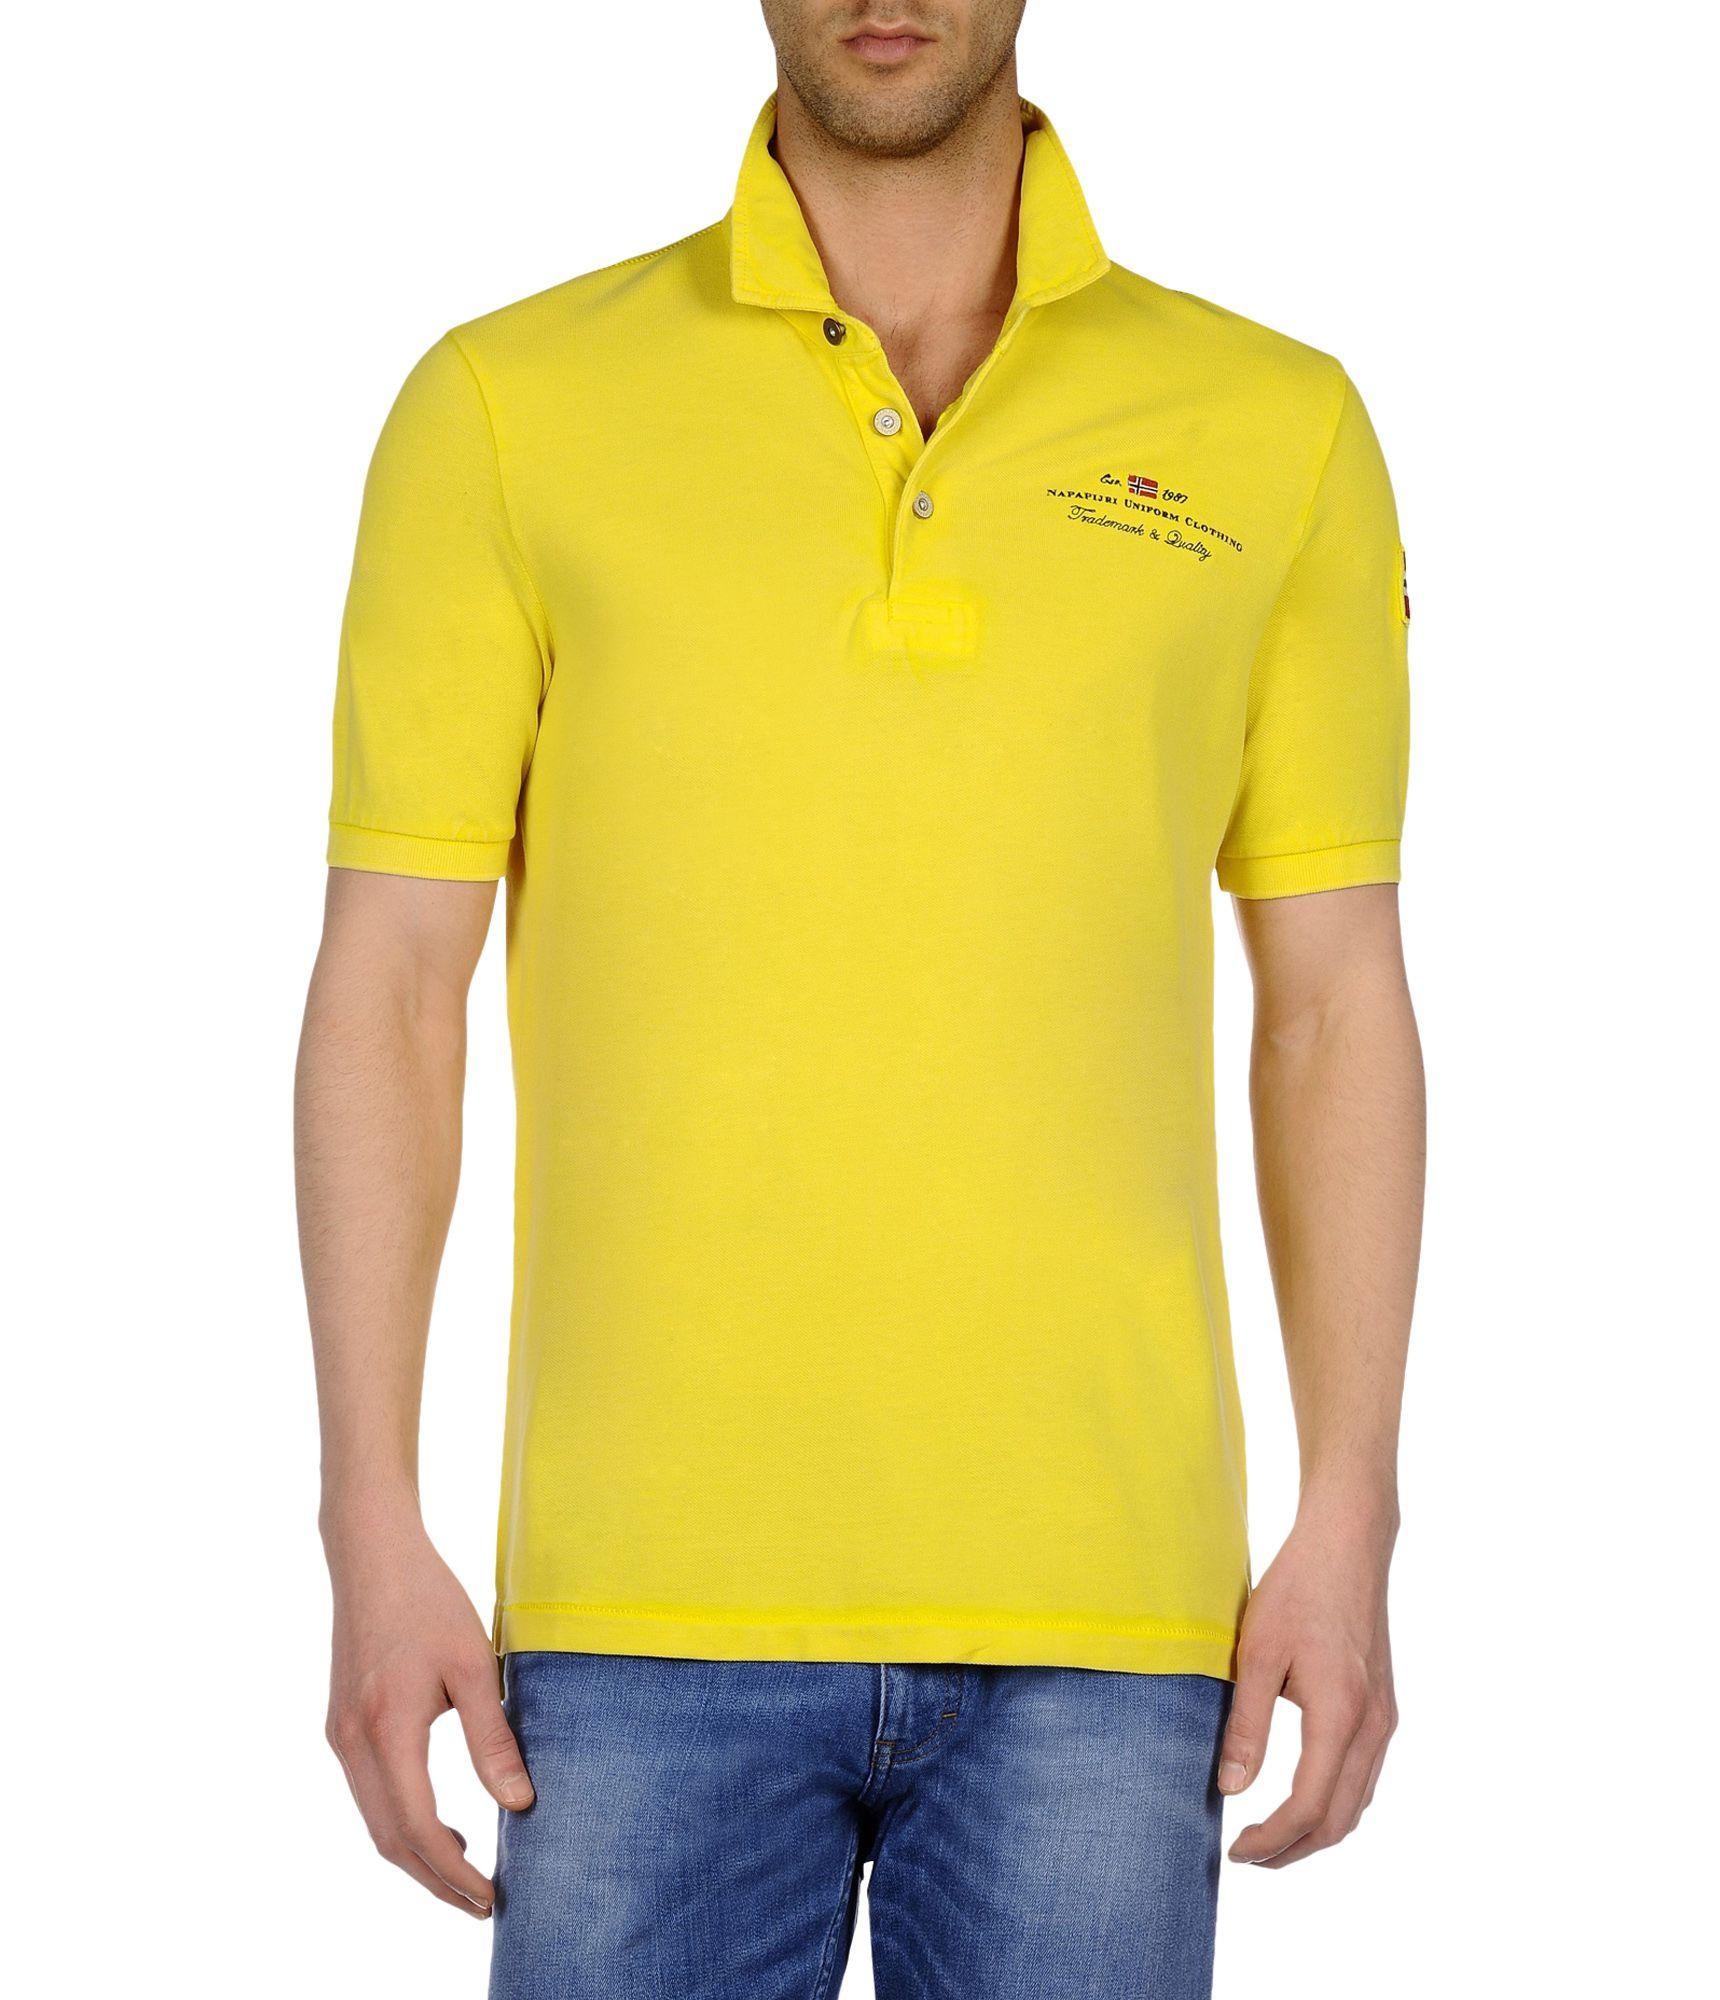 Napapijri Yellow Polo Shirt For Men Lyst